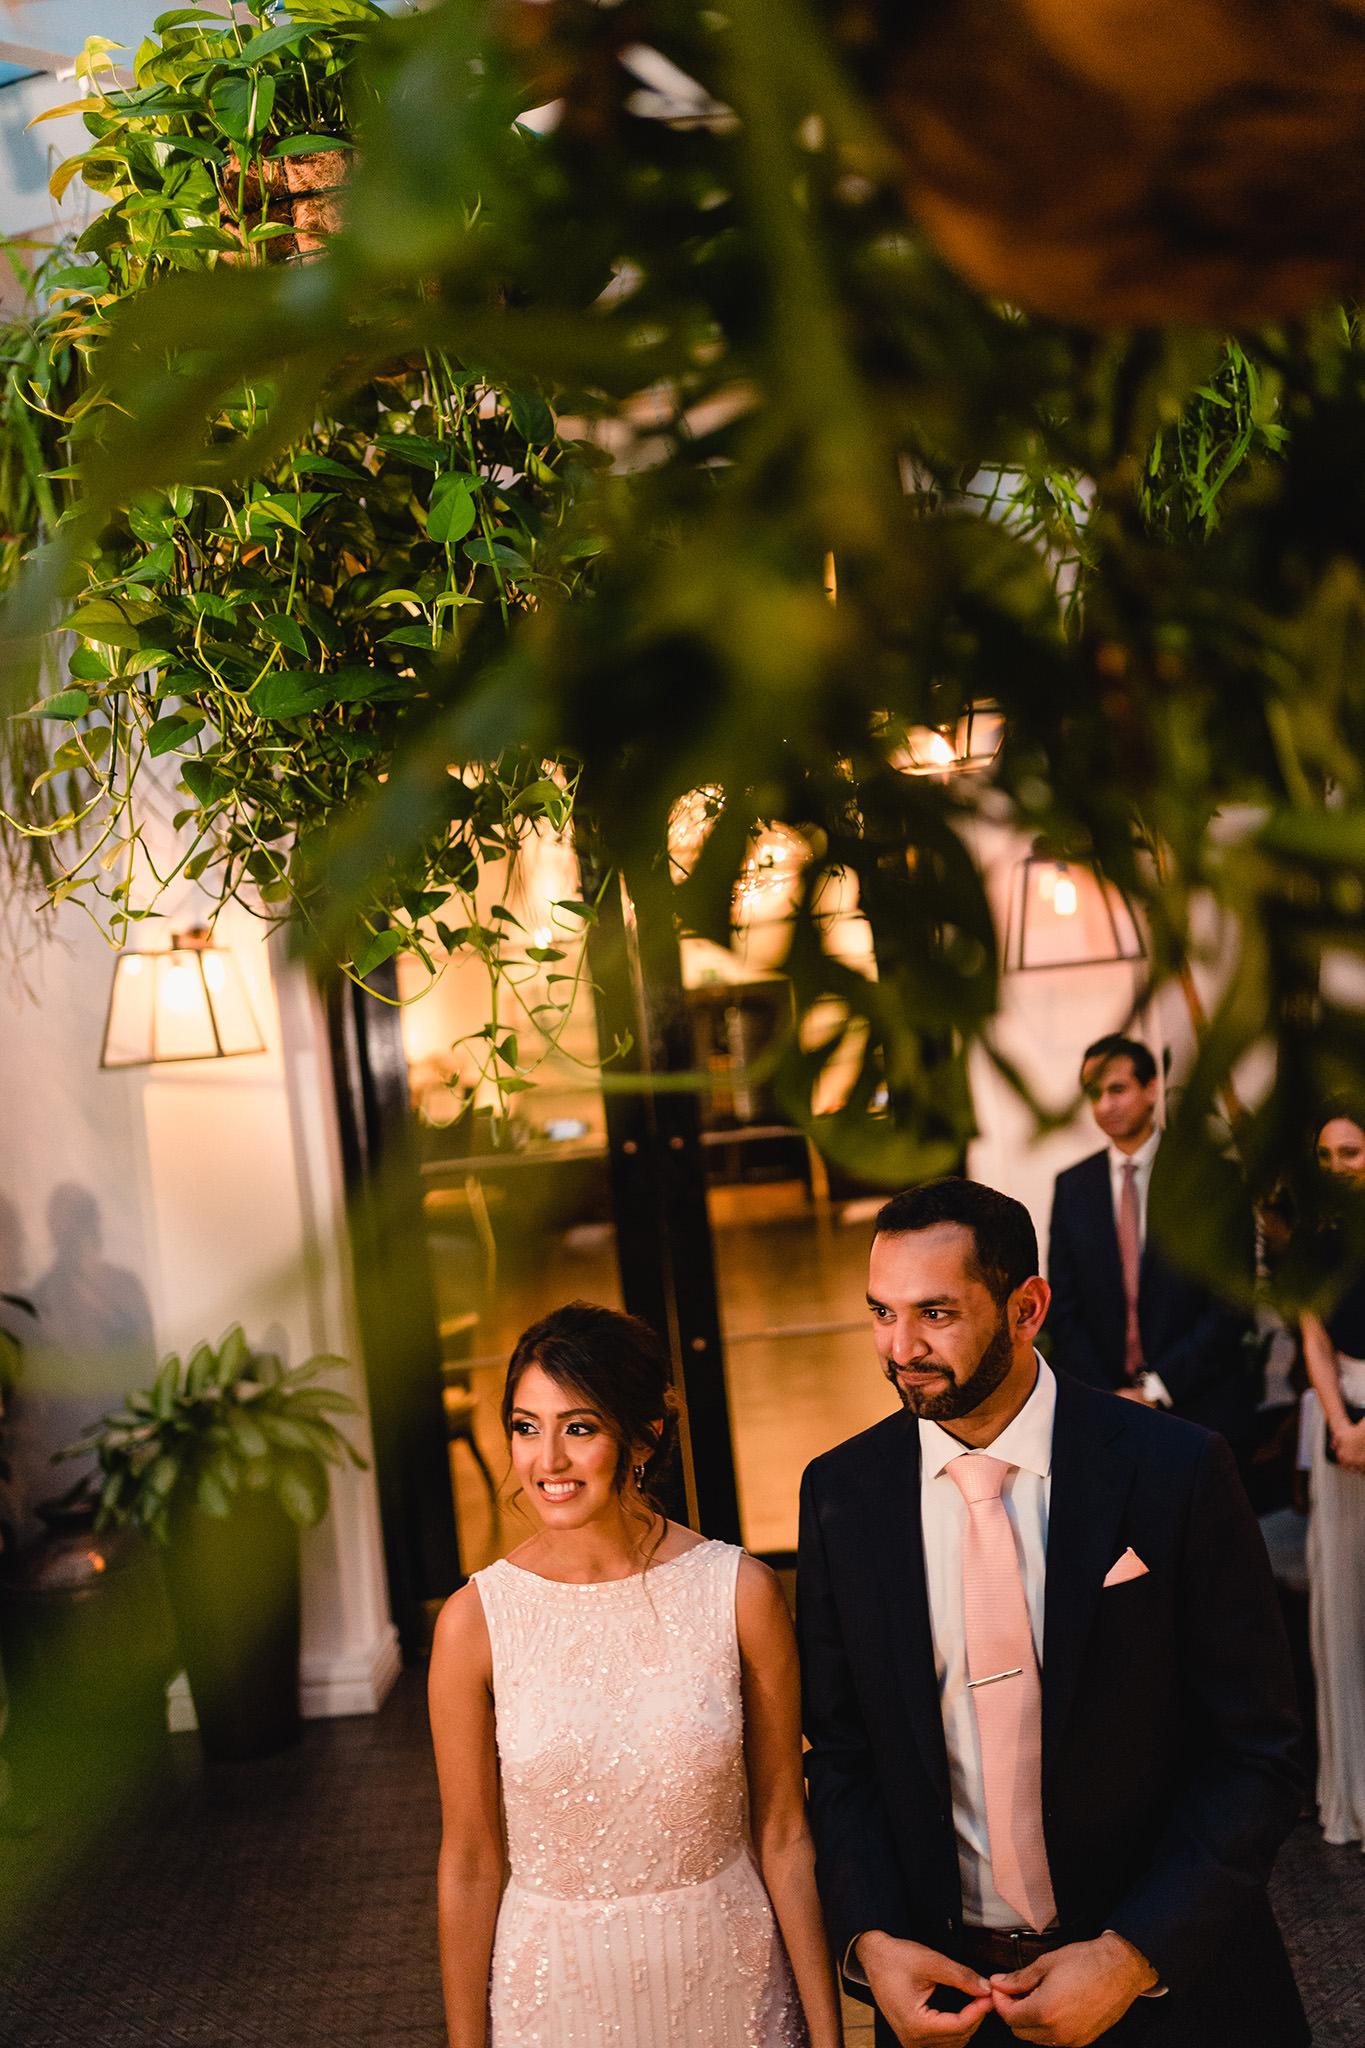 natural civil wedding photo